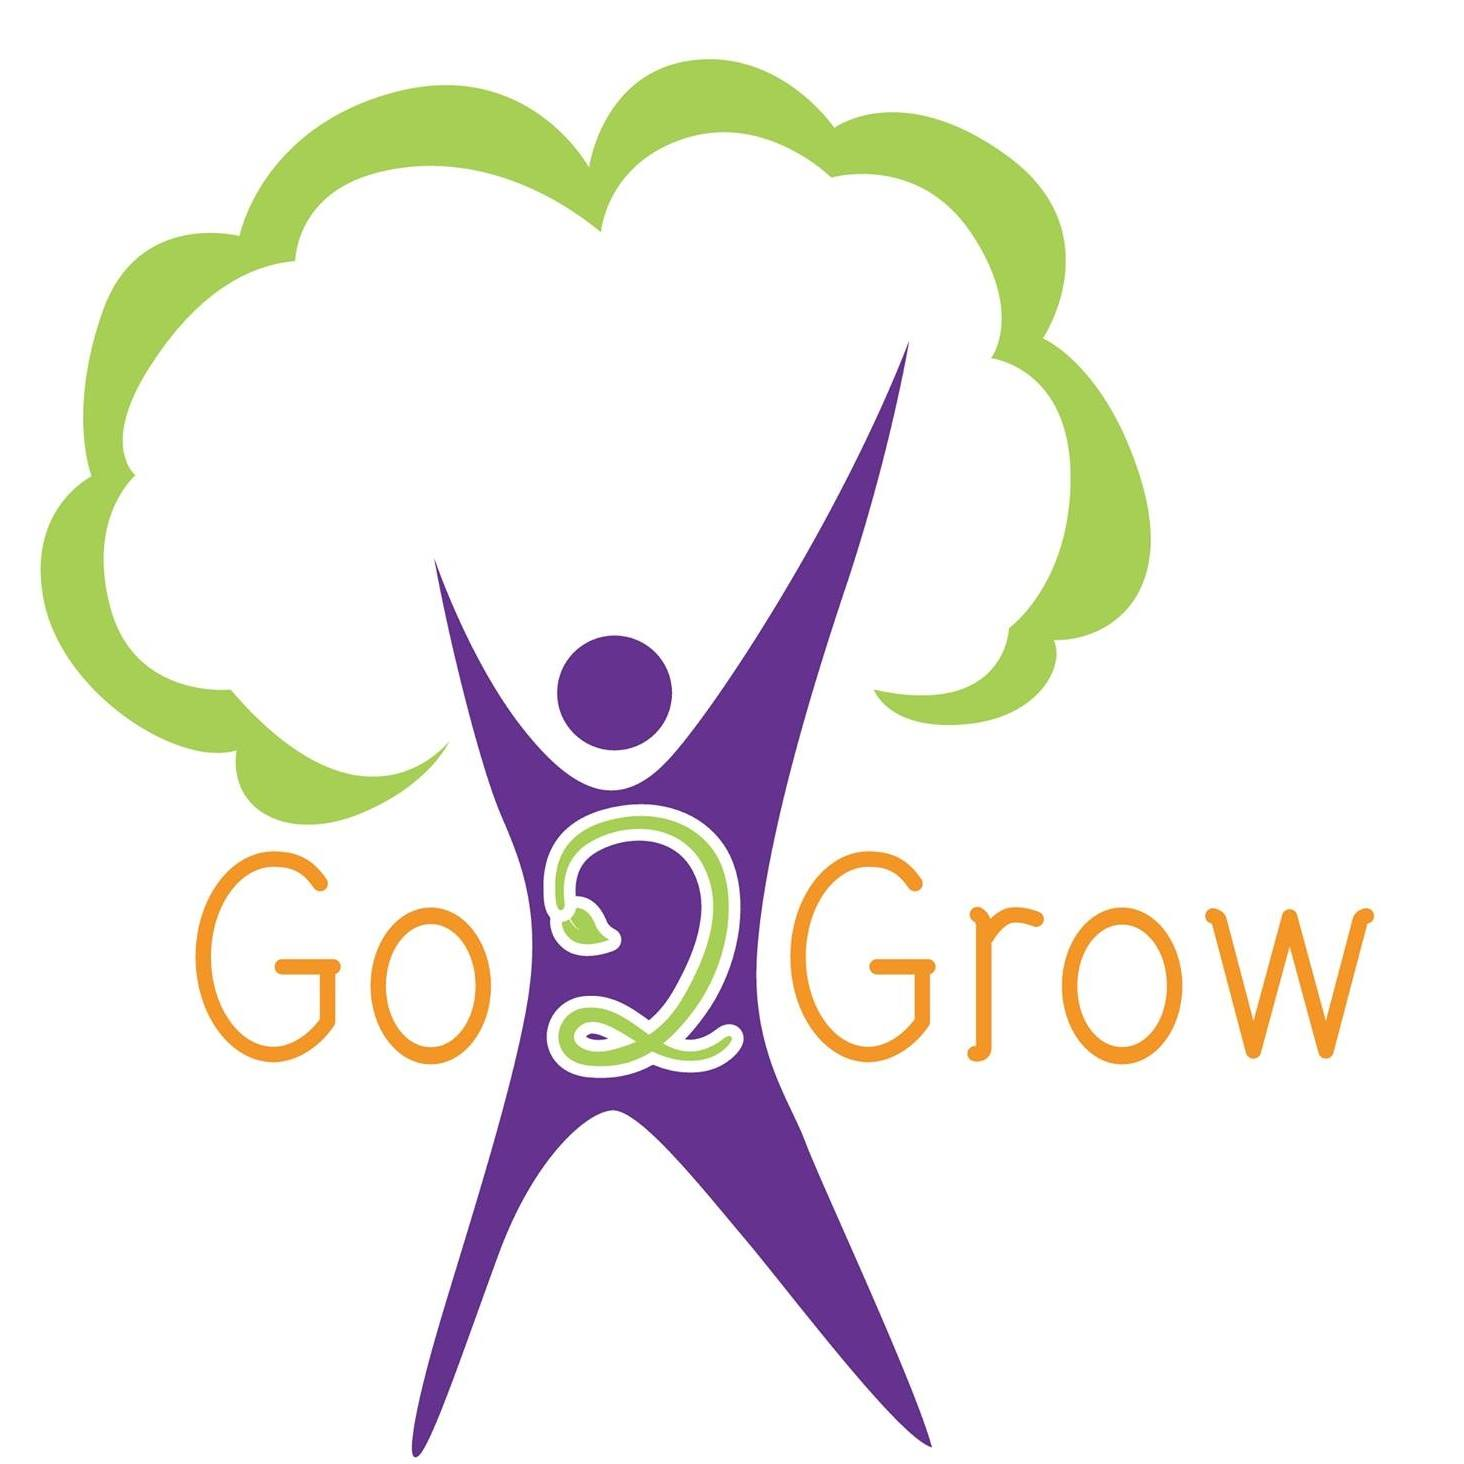 Go2Grow Mentorship Program